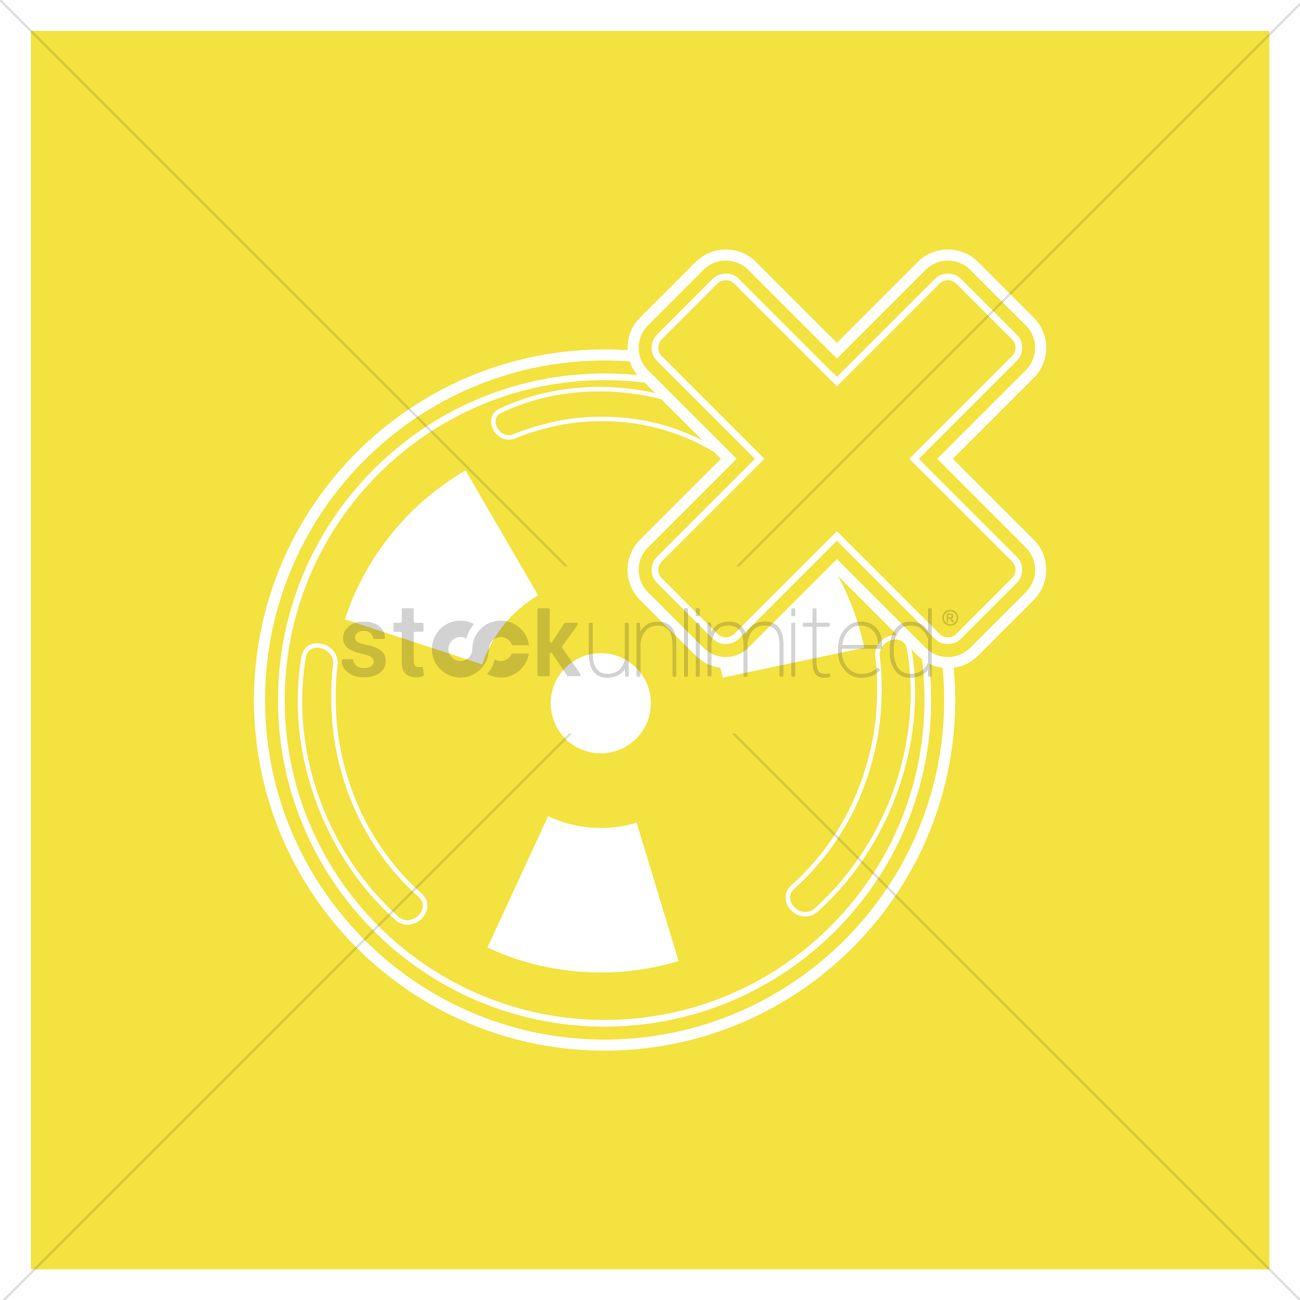 Radioactive symbol vector image 2017327 stockunlimited radioactive symbol vector graphic buycottarizona